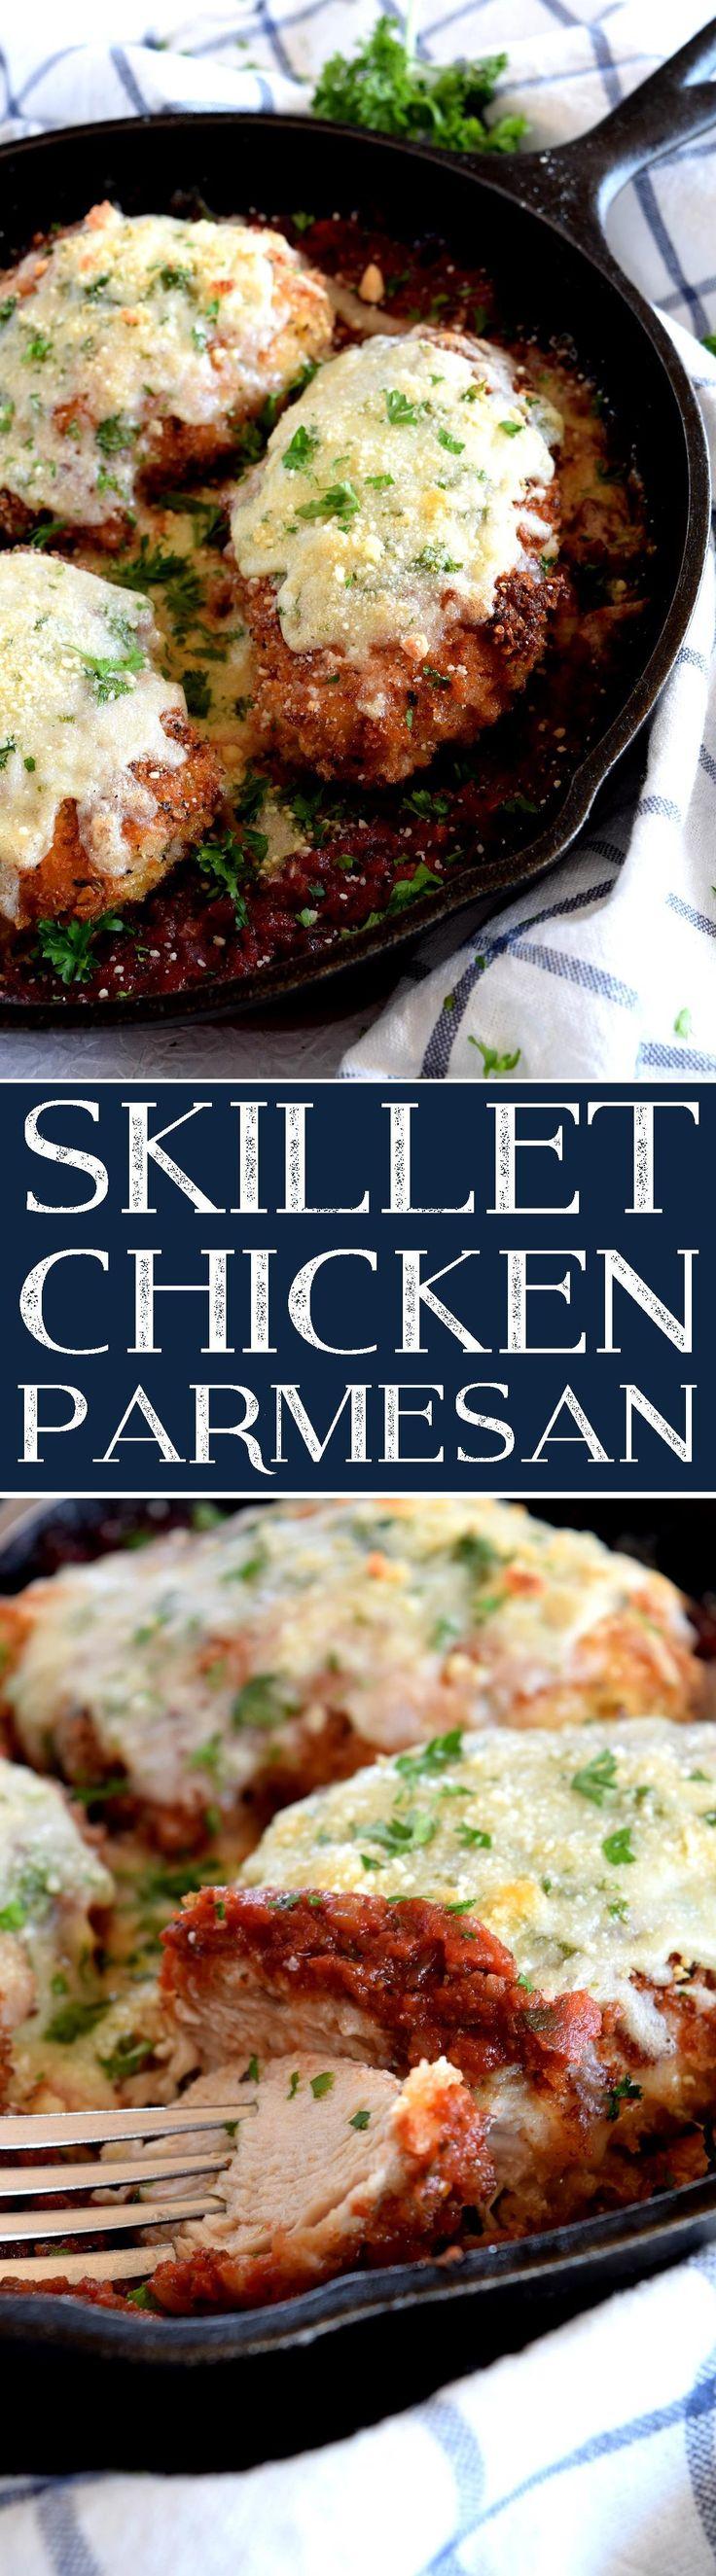 Skillet Chicken Parmesan